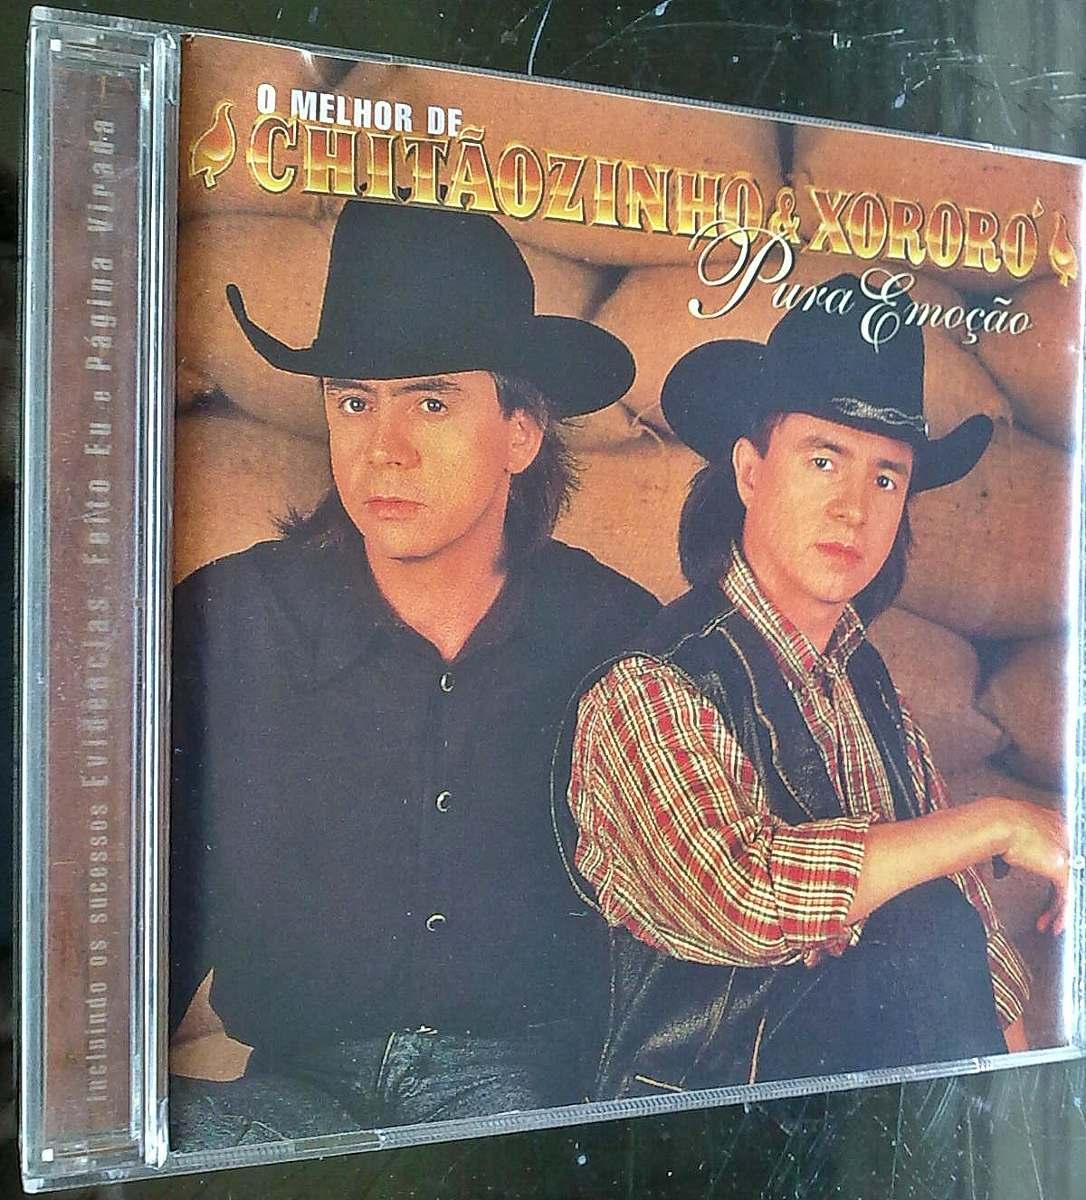 chitaozinho e xororo jeito de cowboy